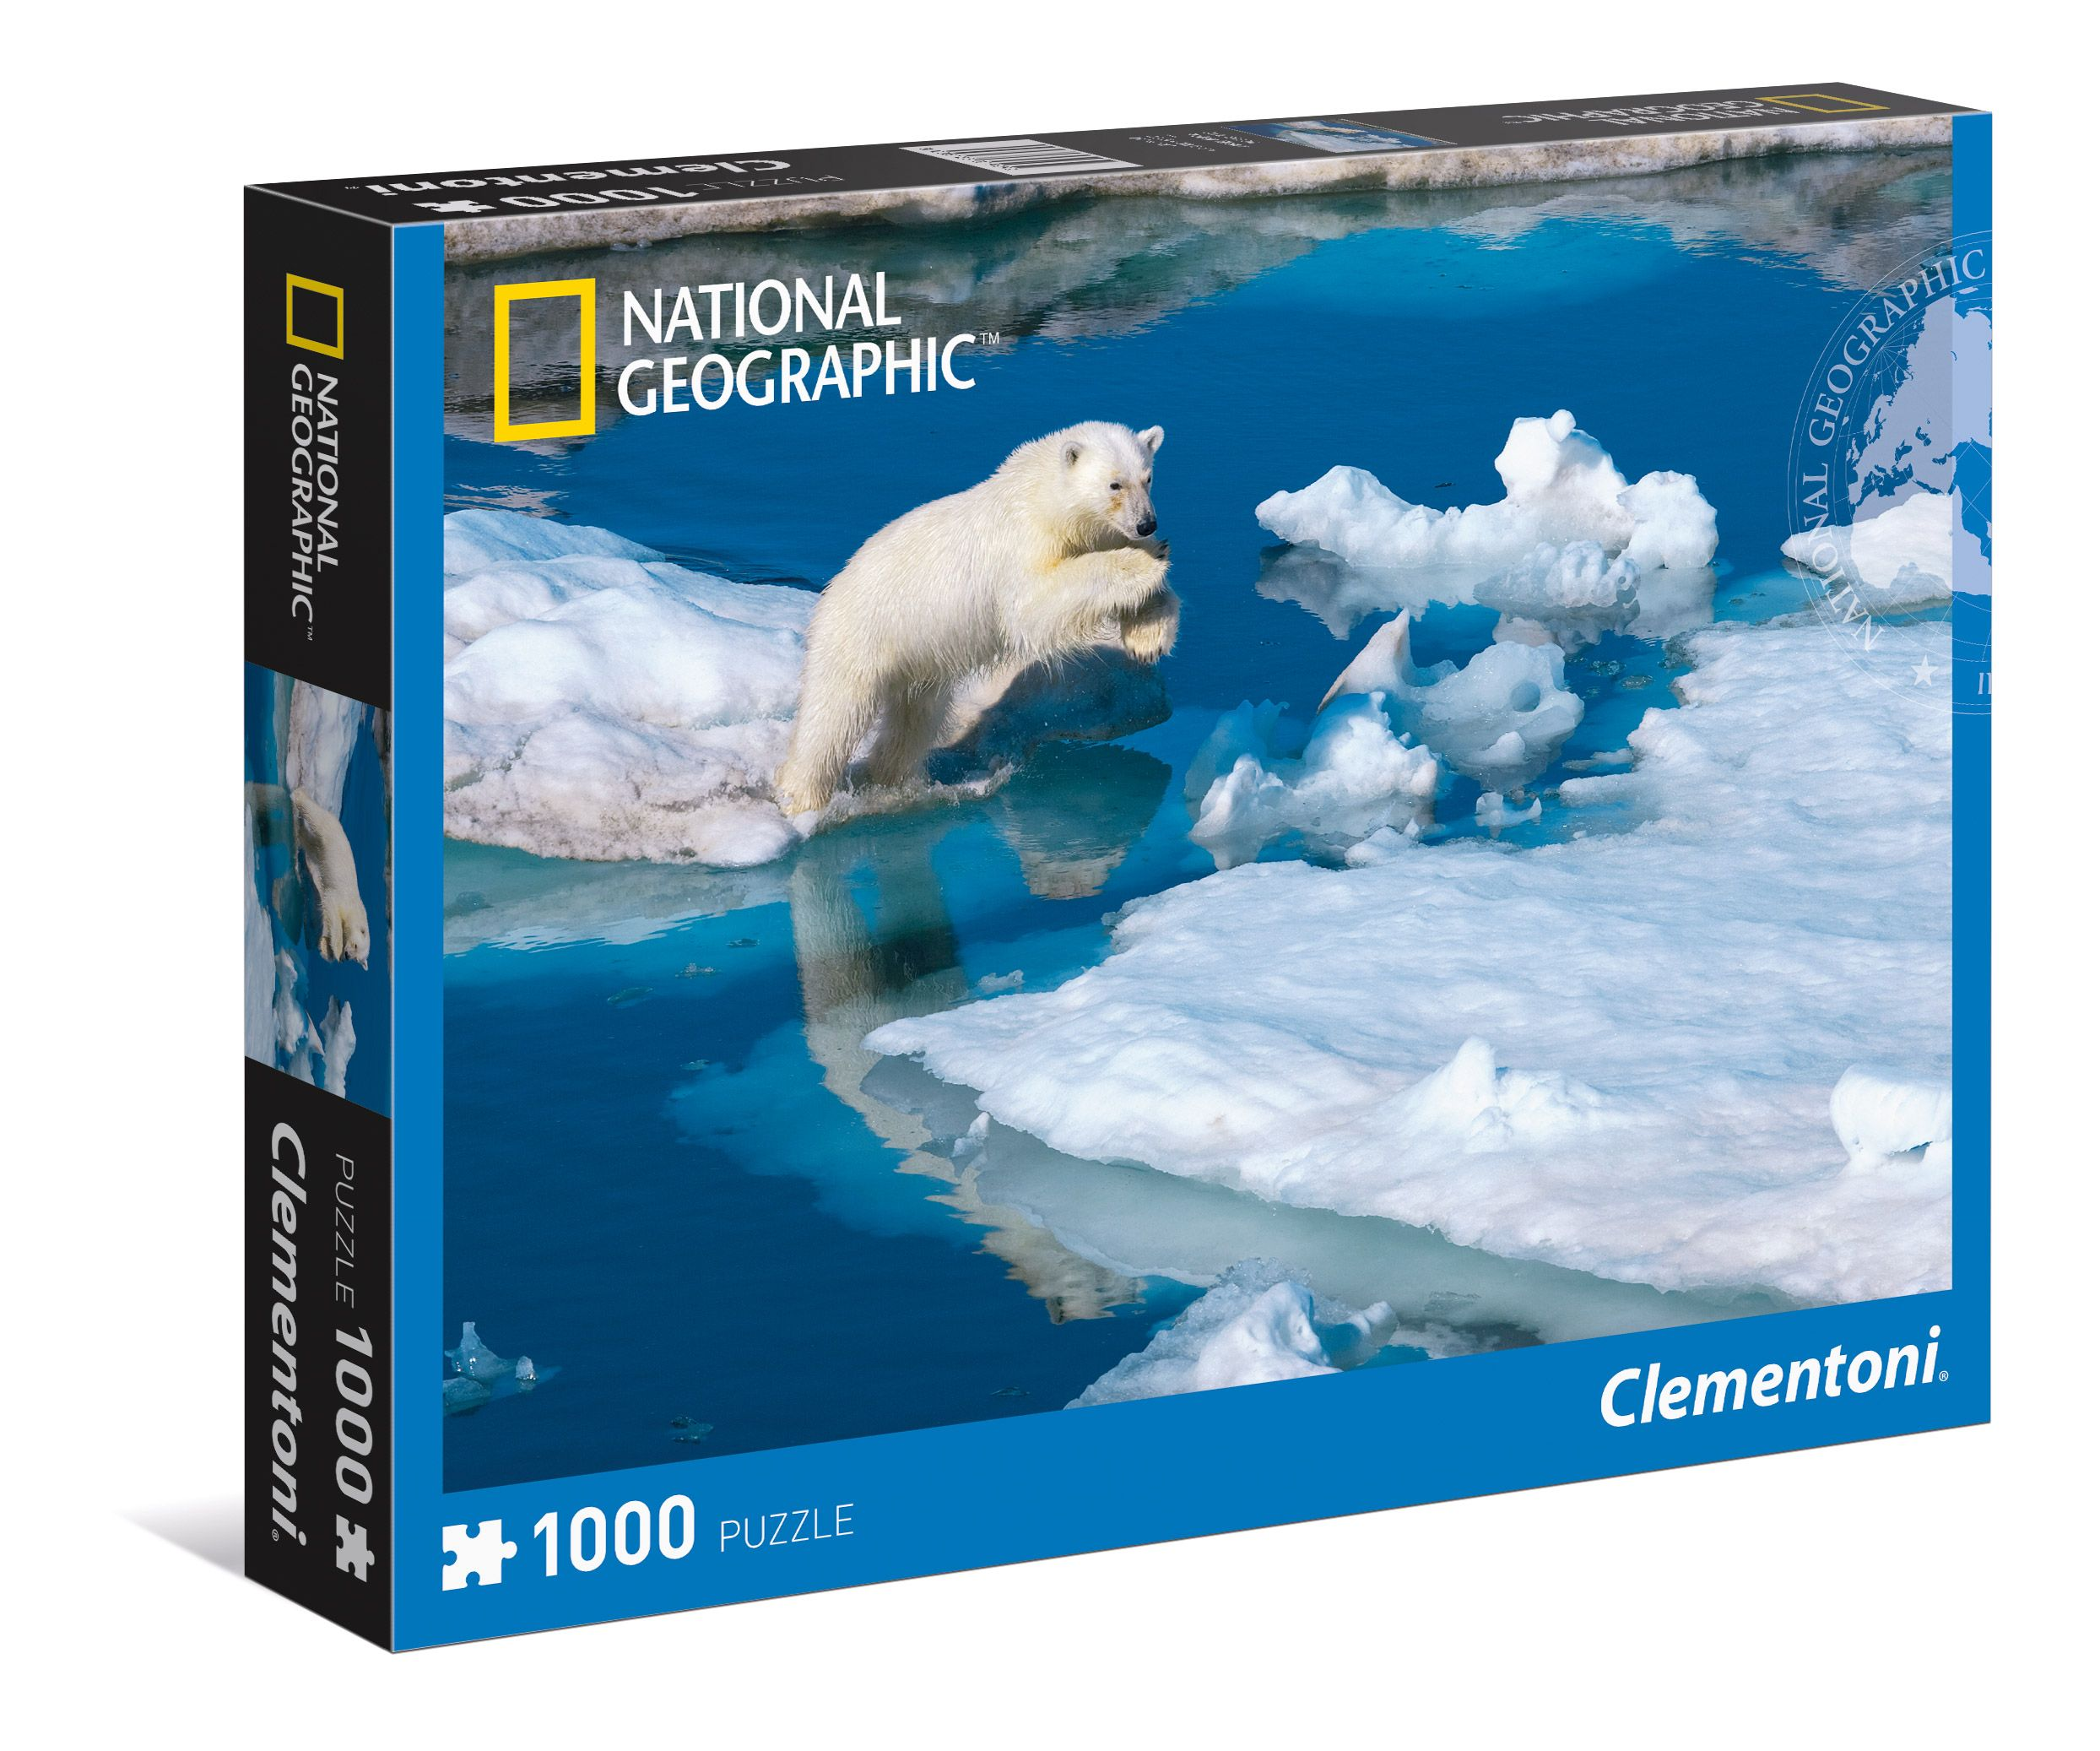 АКЦИЯ19 Пазл 1000 Clementoni 39304 Белый медвежонок на льдинах